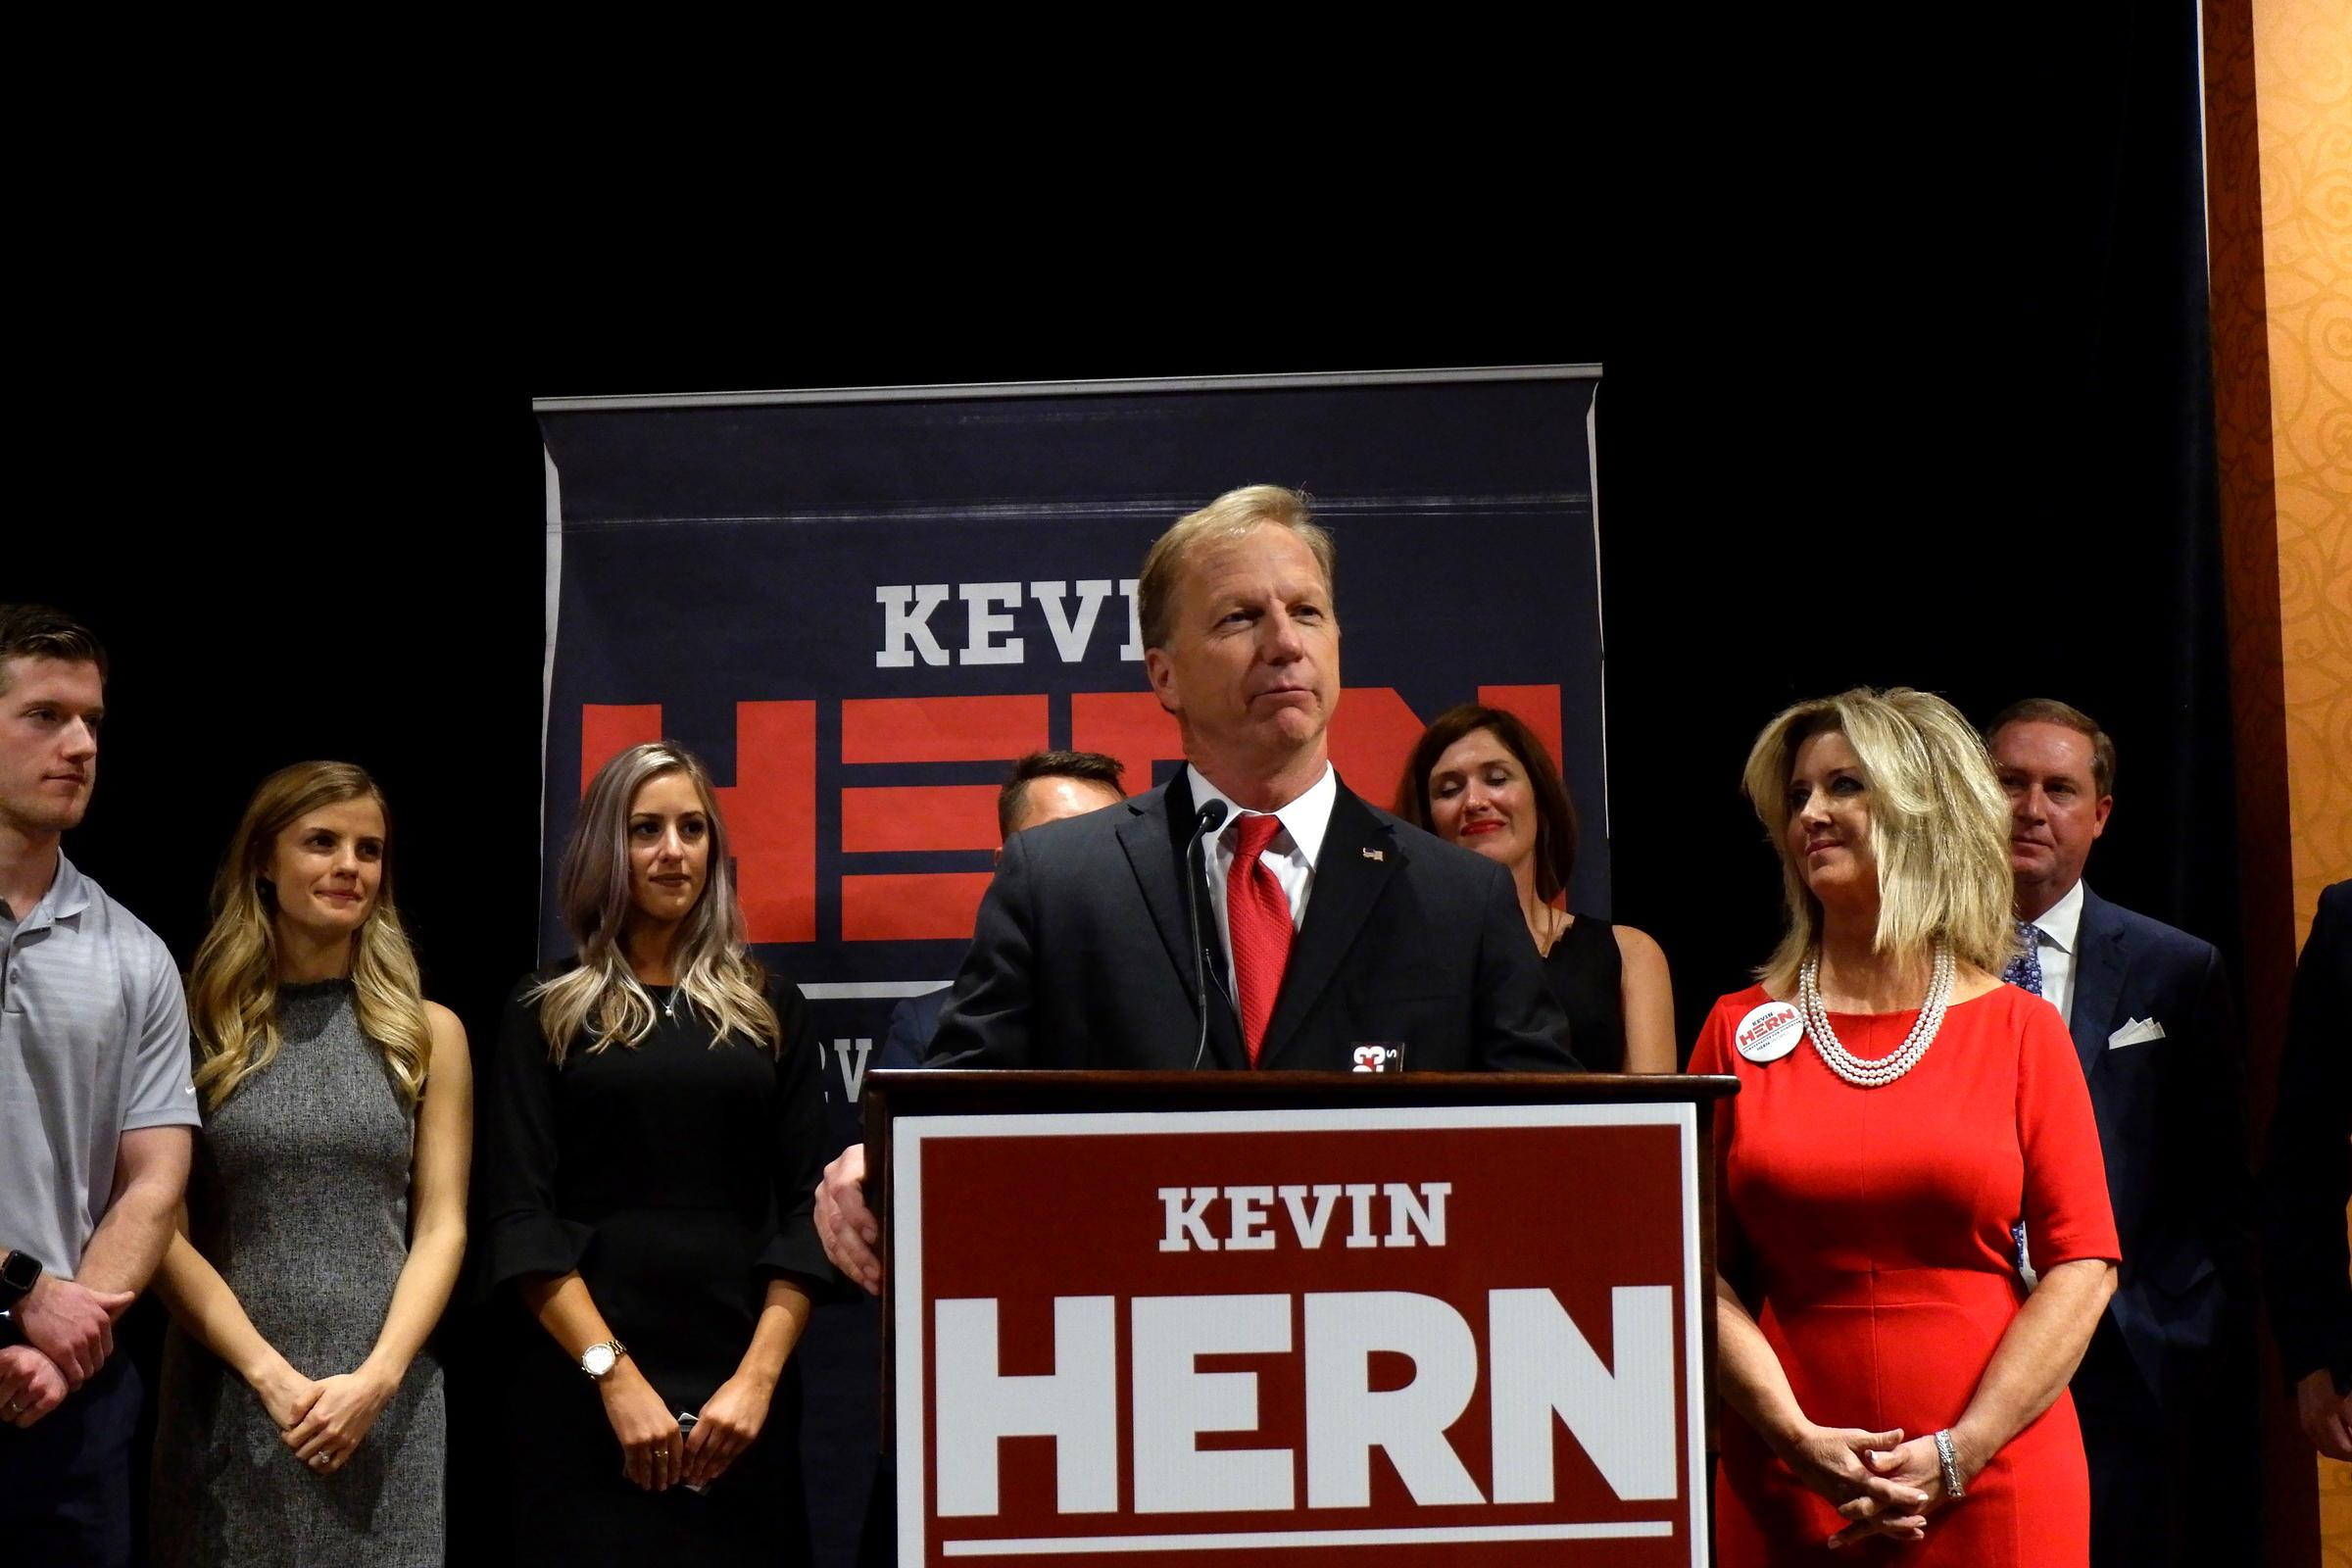 kevin_hern_election_night_2018_0.jpg